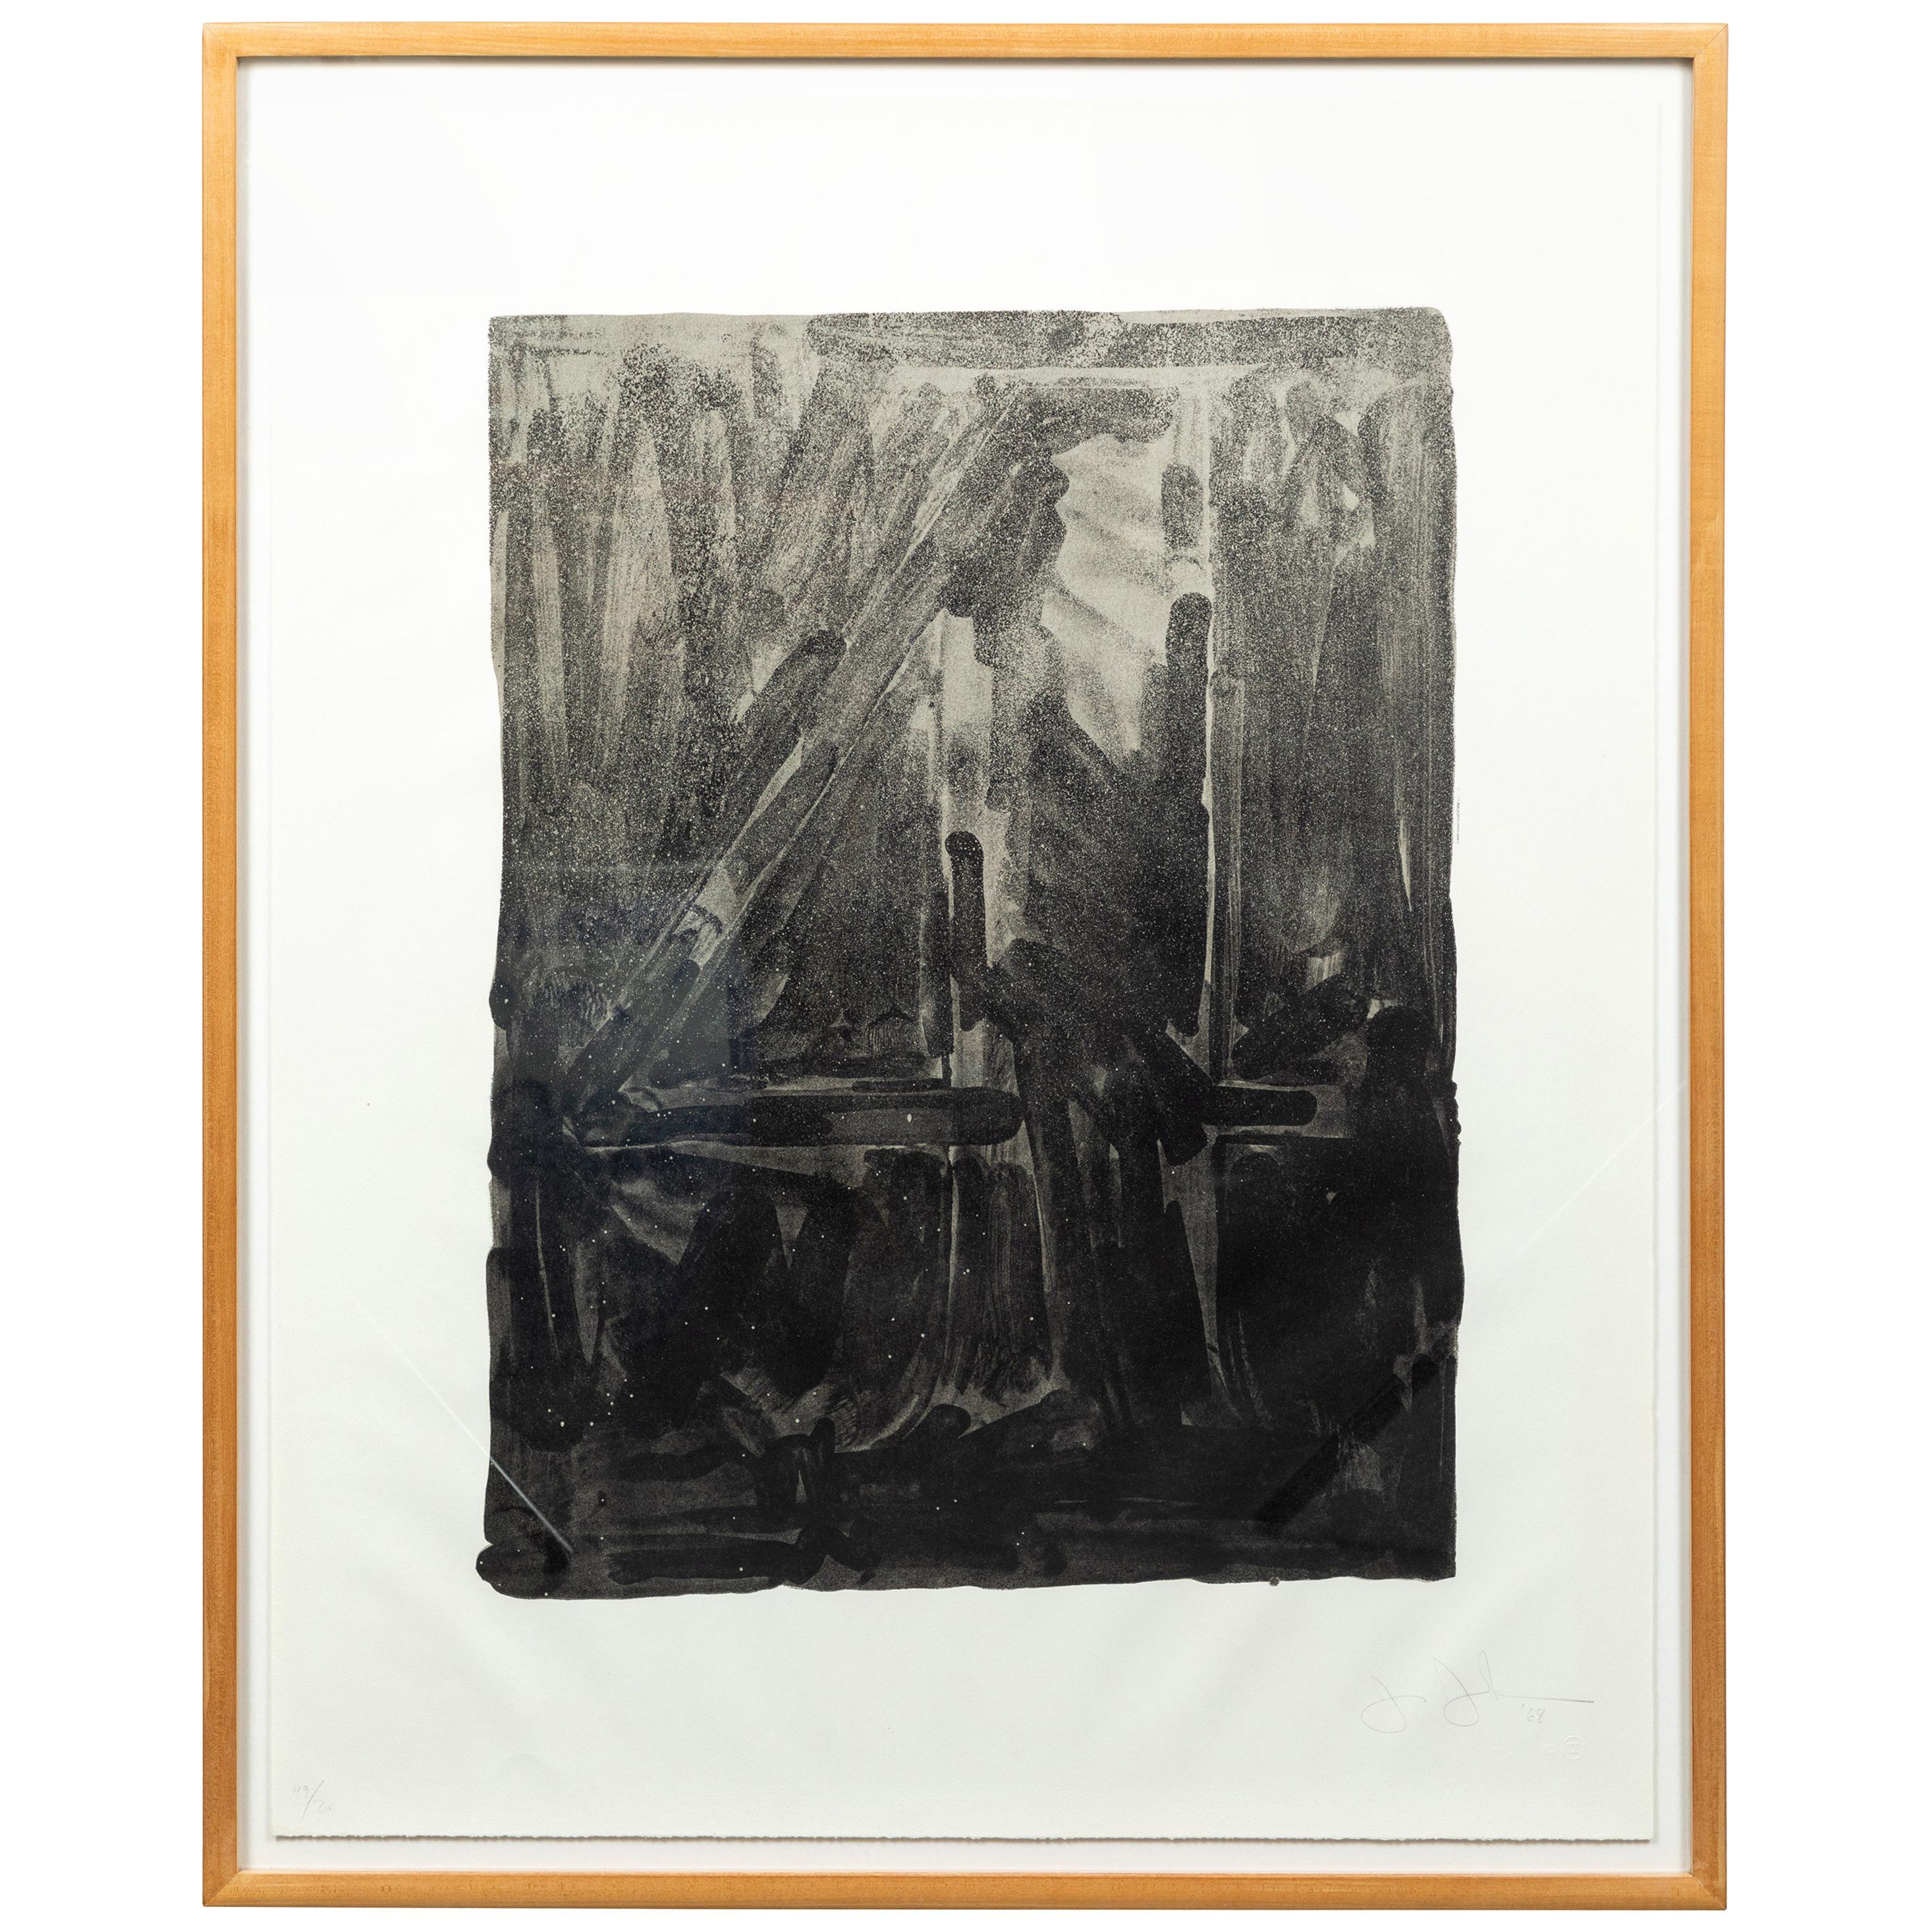 1968, Jasper Johns Etching